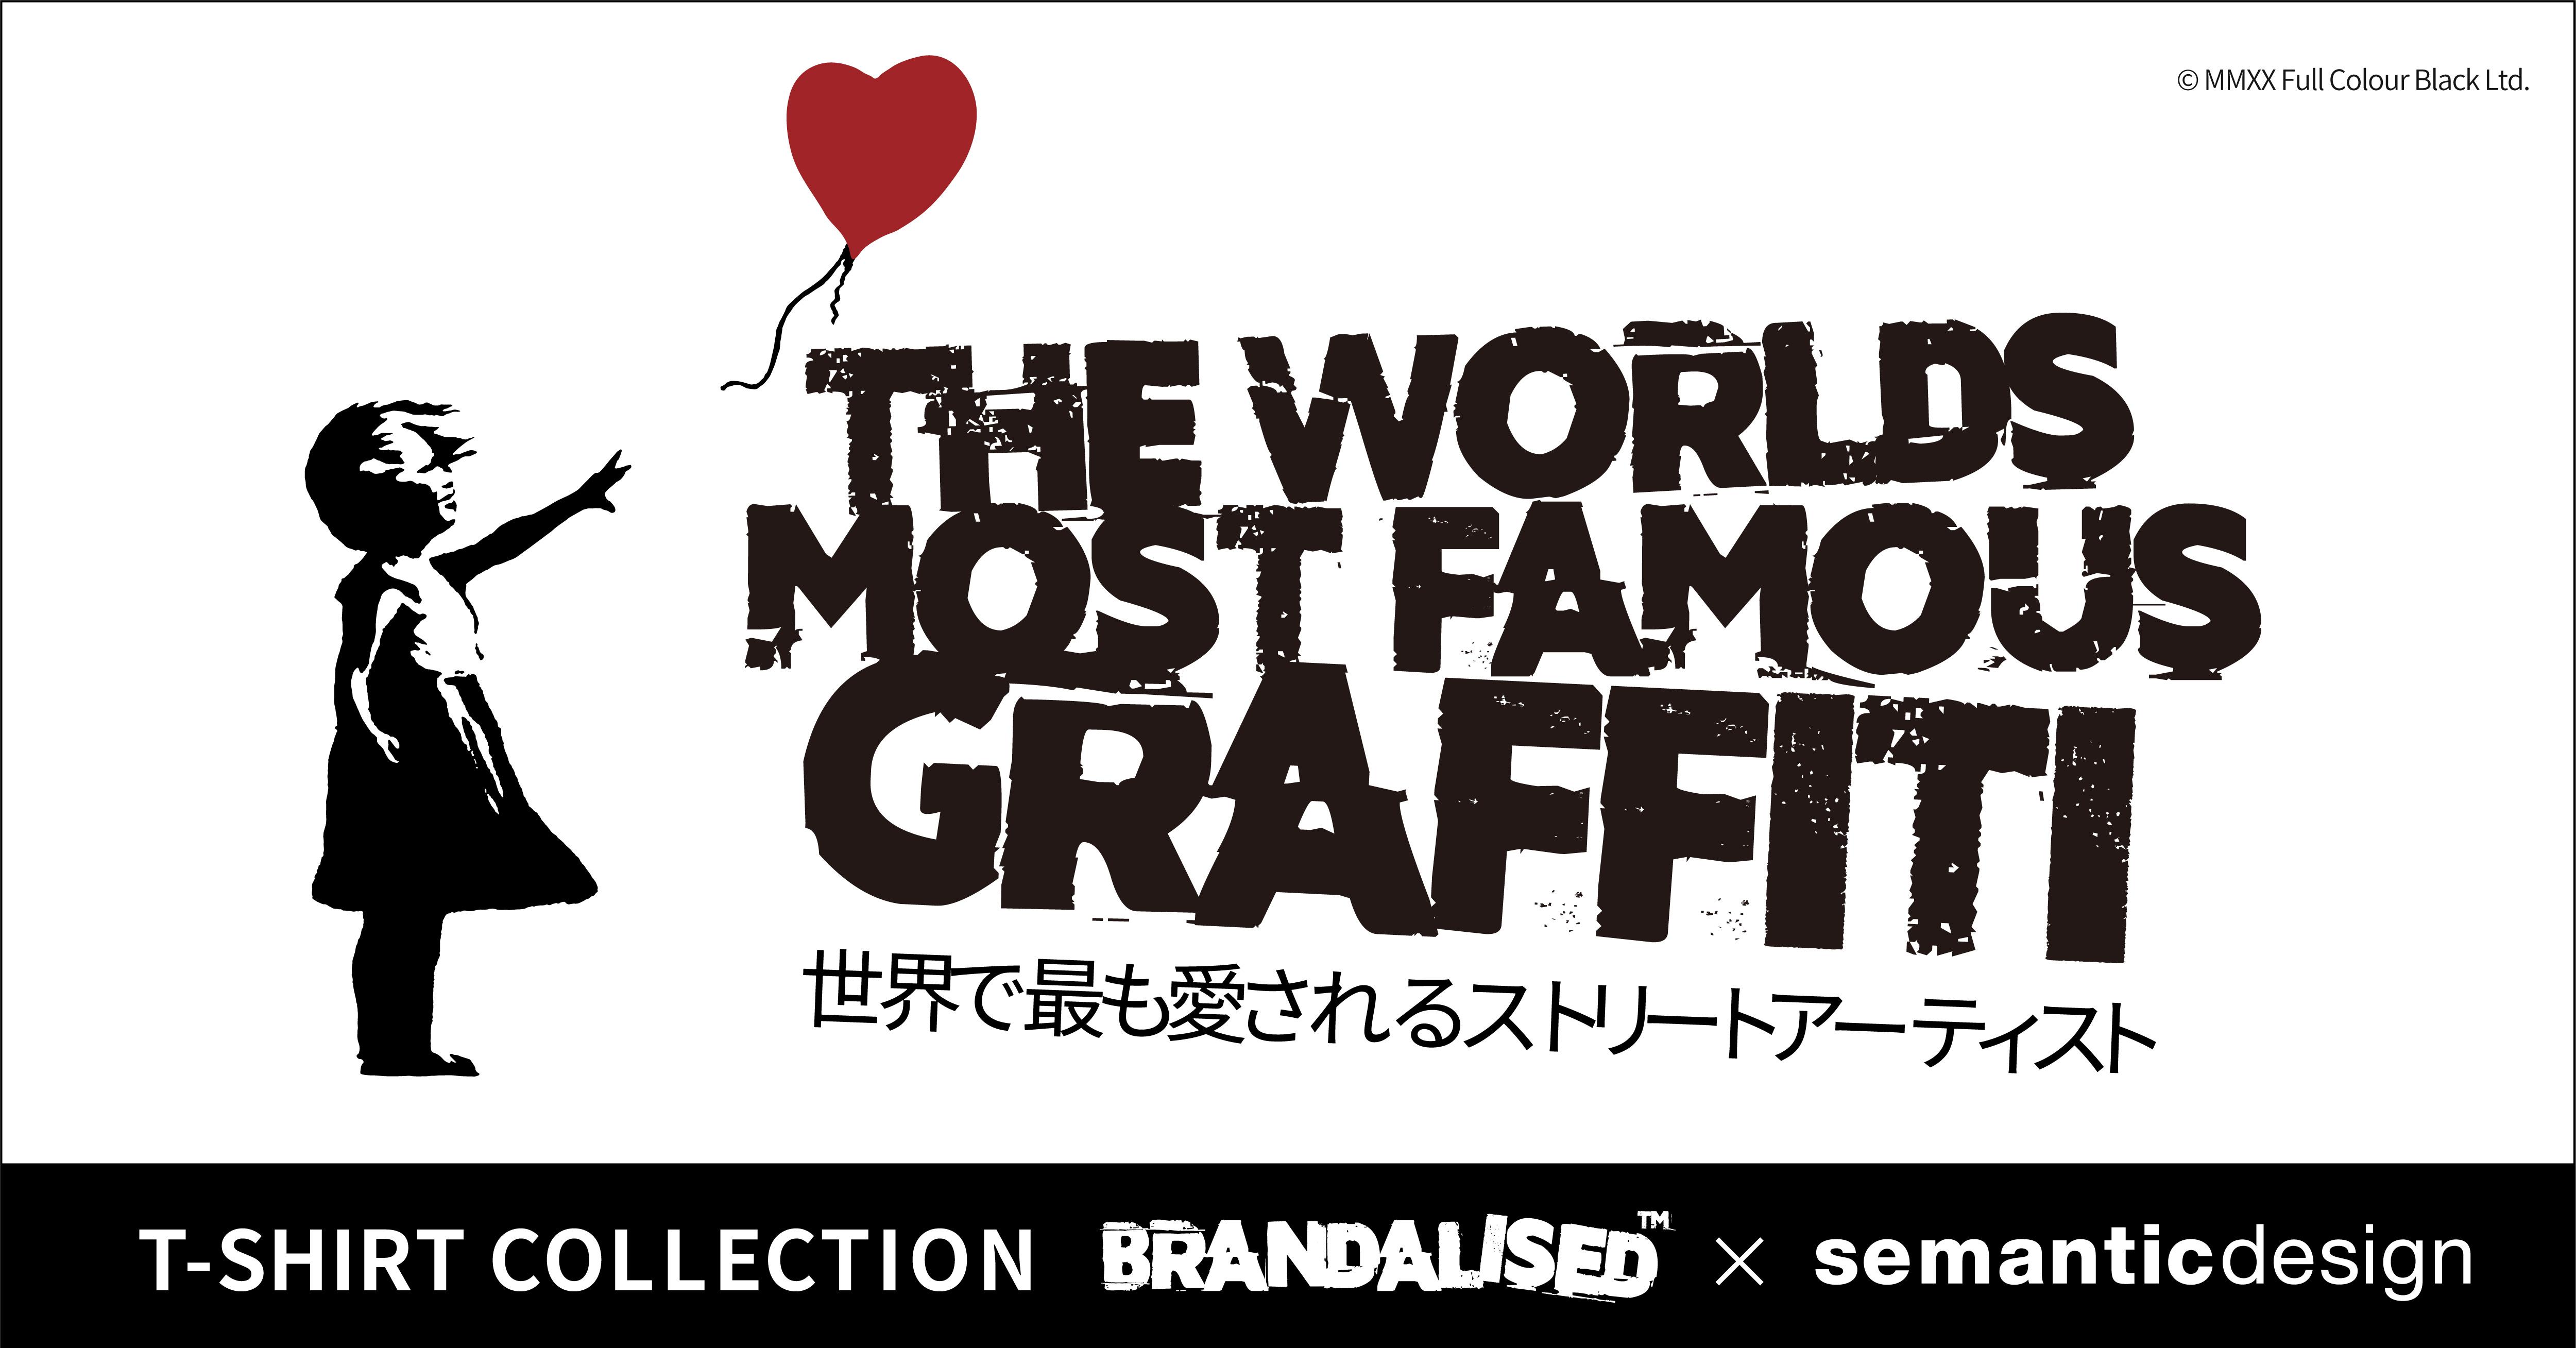 T-Shirt Collection 世界で最も愛されるストリートアーティスト